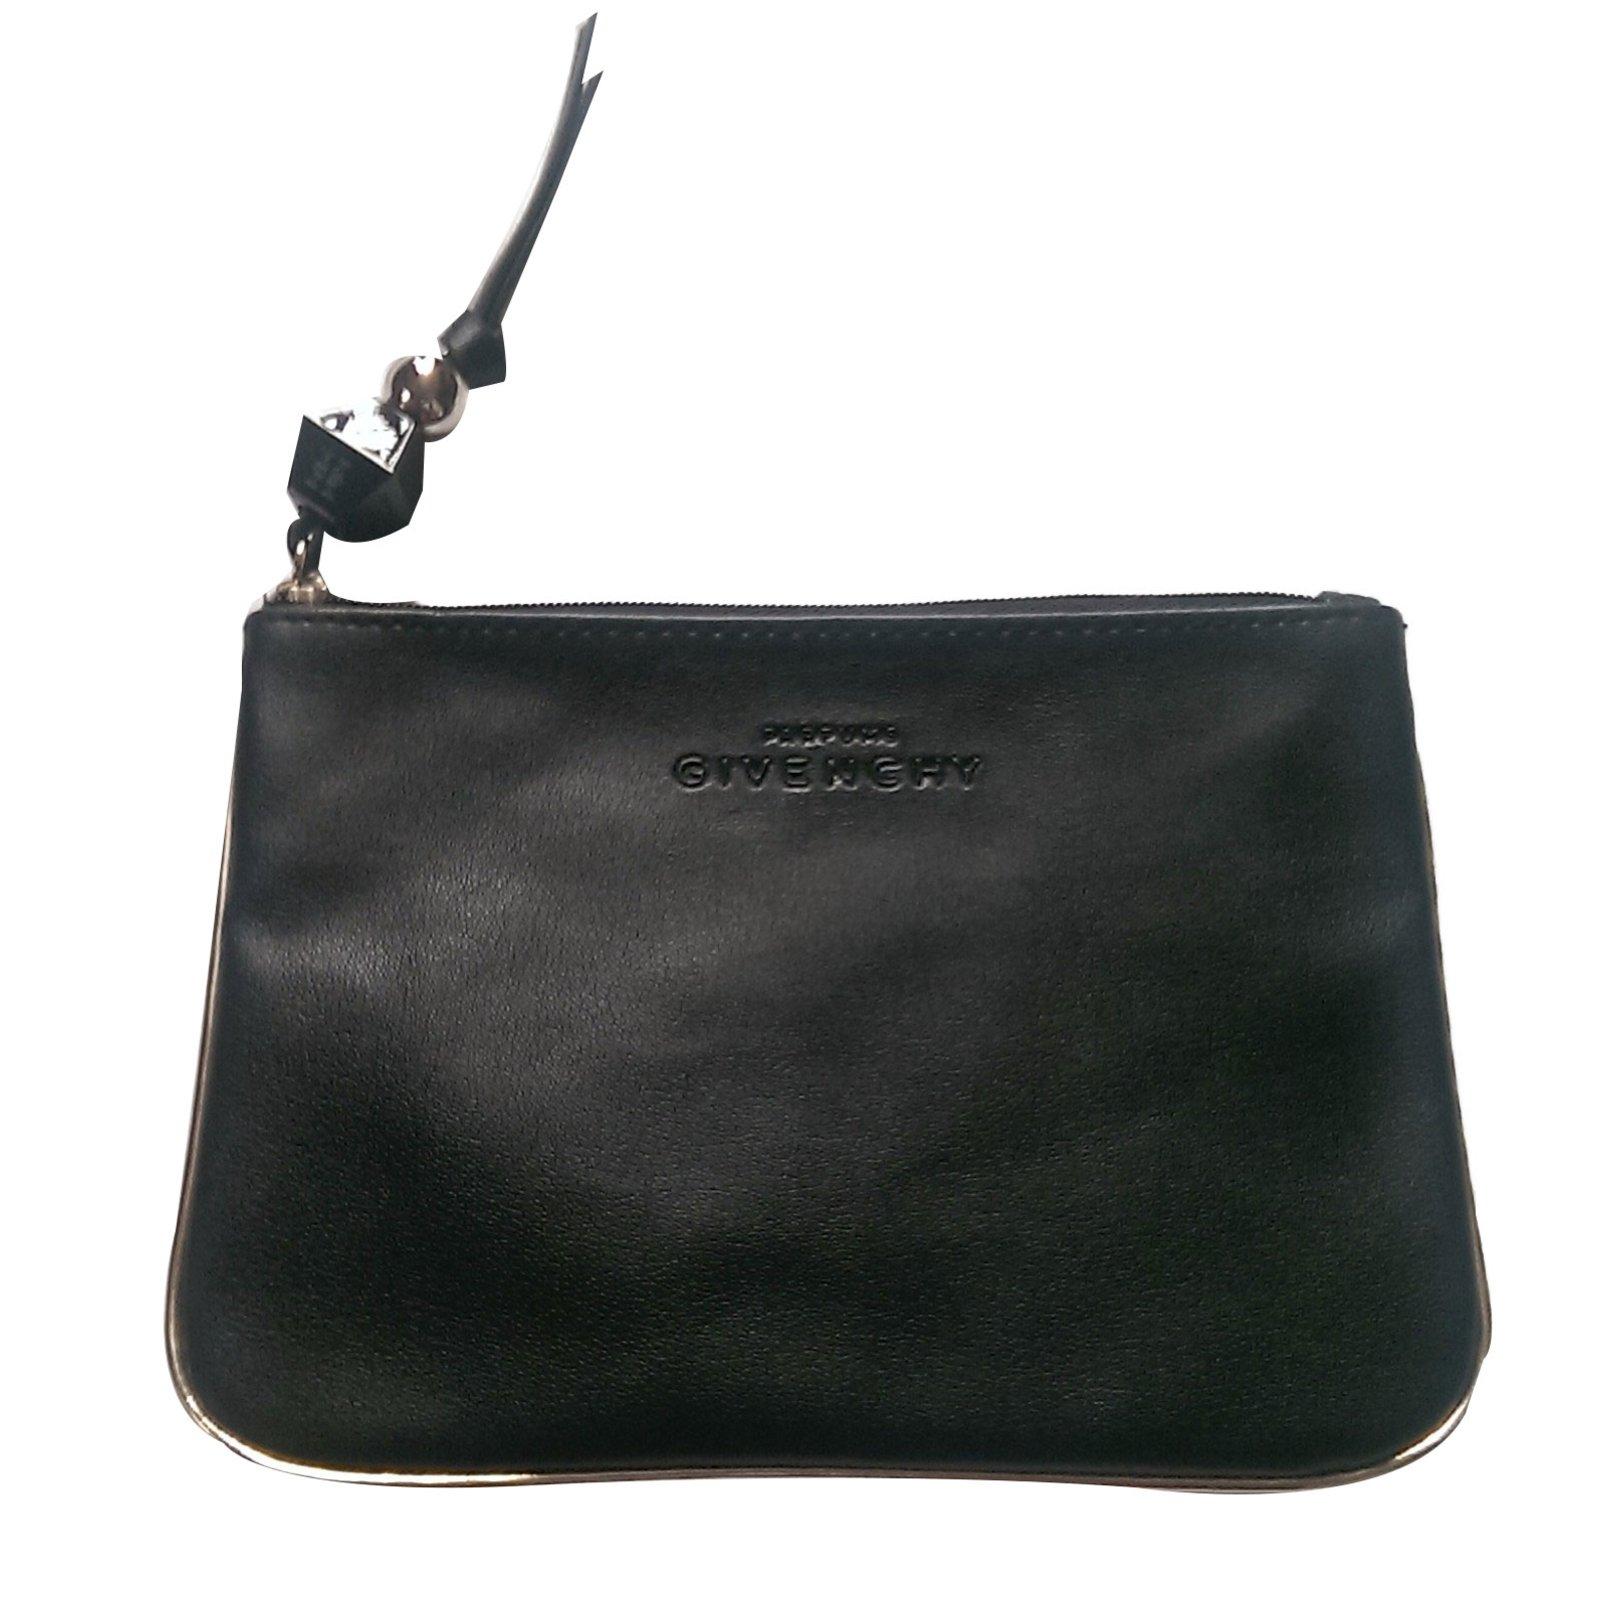 Petite maroquinerie Givenchy Trousse de maquillage Polyester Noir ref.49264 c22885ae4b5